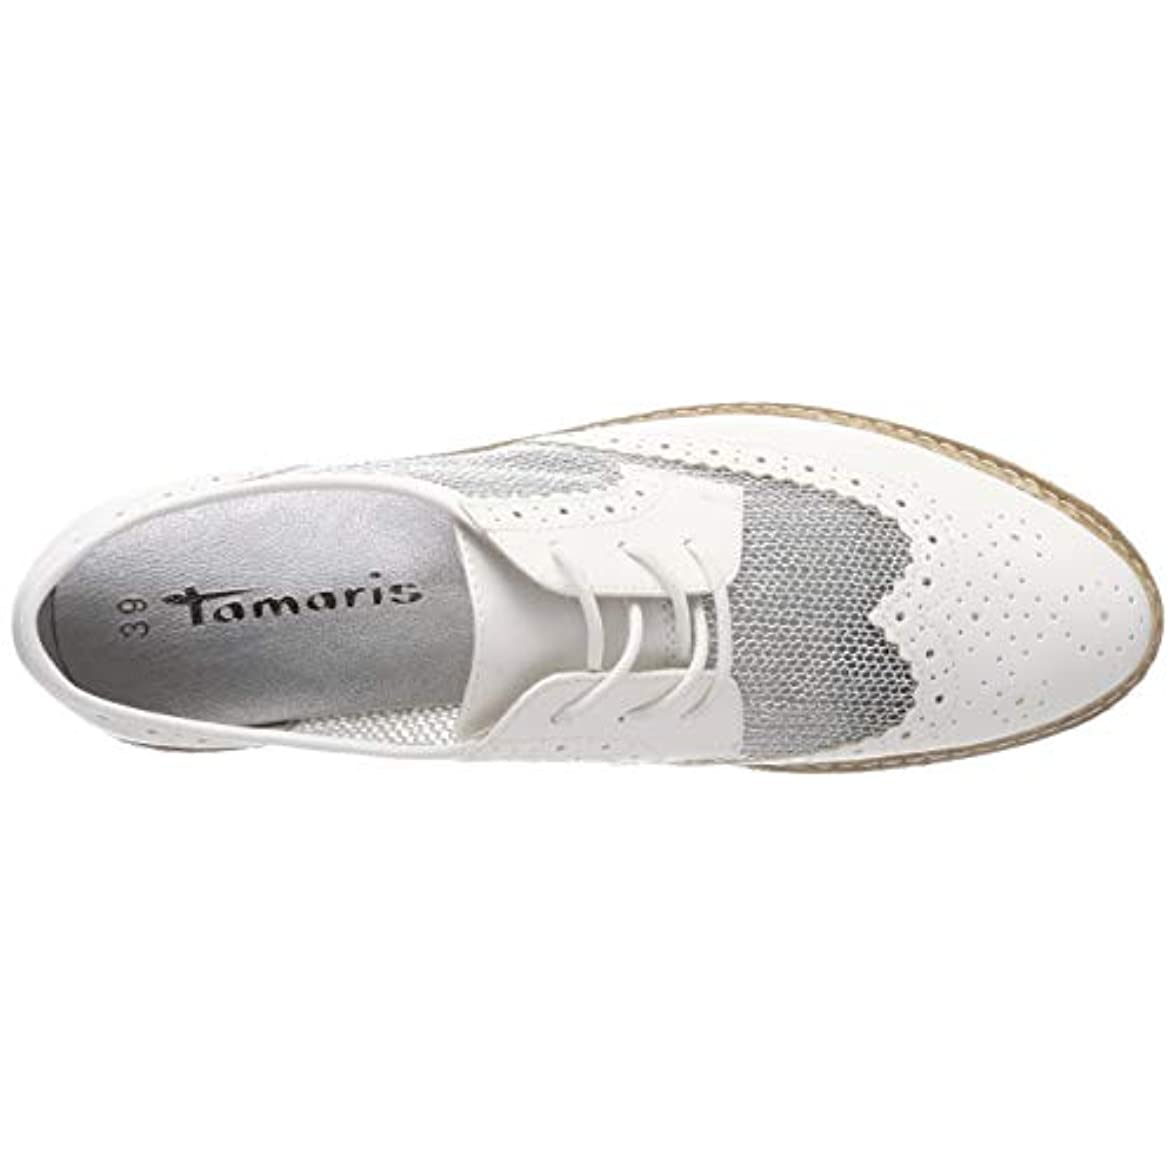 Tamaris 1-1-23720-22 100 Scarpe Da Ginnastica Basse Donna